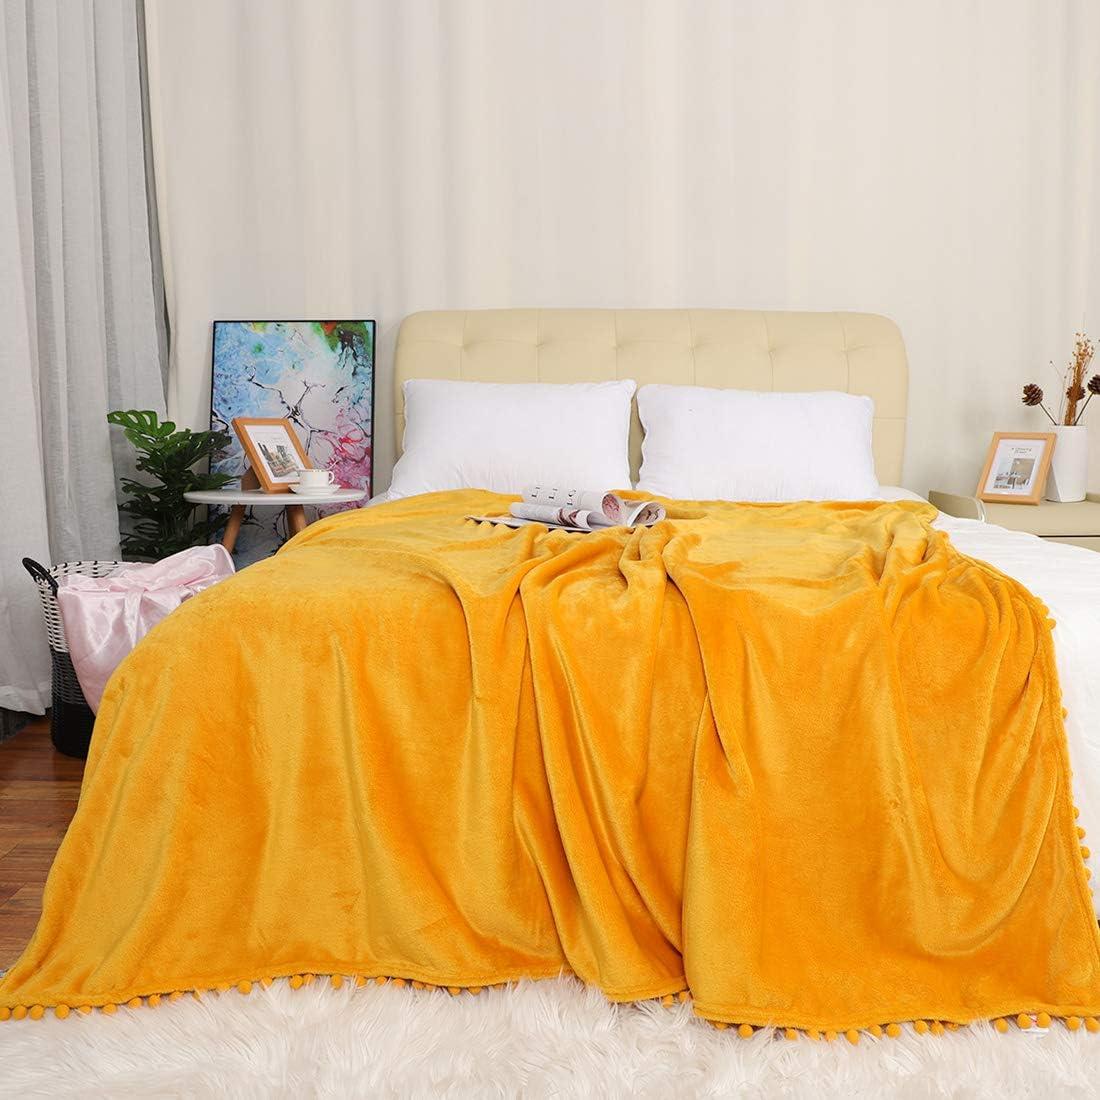 PiccoCasa Flannel Fleece Throw Blanket with Pompom Fringe Soft Warm Microfiber Sofa Throw Fuzzy Plush 330GSM Lightweight Decorative Solid Blanket for Sofa Couch Chair 50 x 59 Inch Slategray